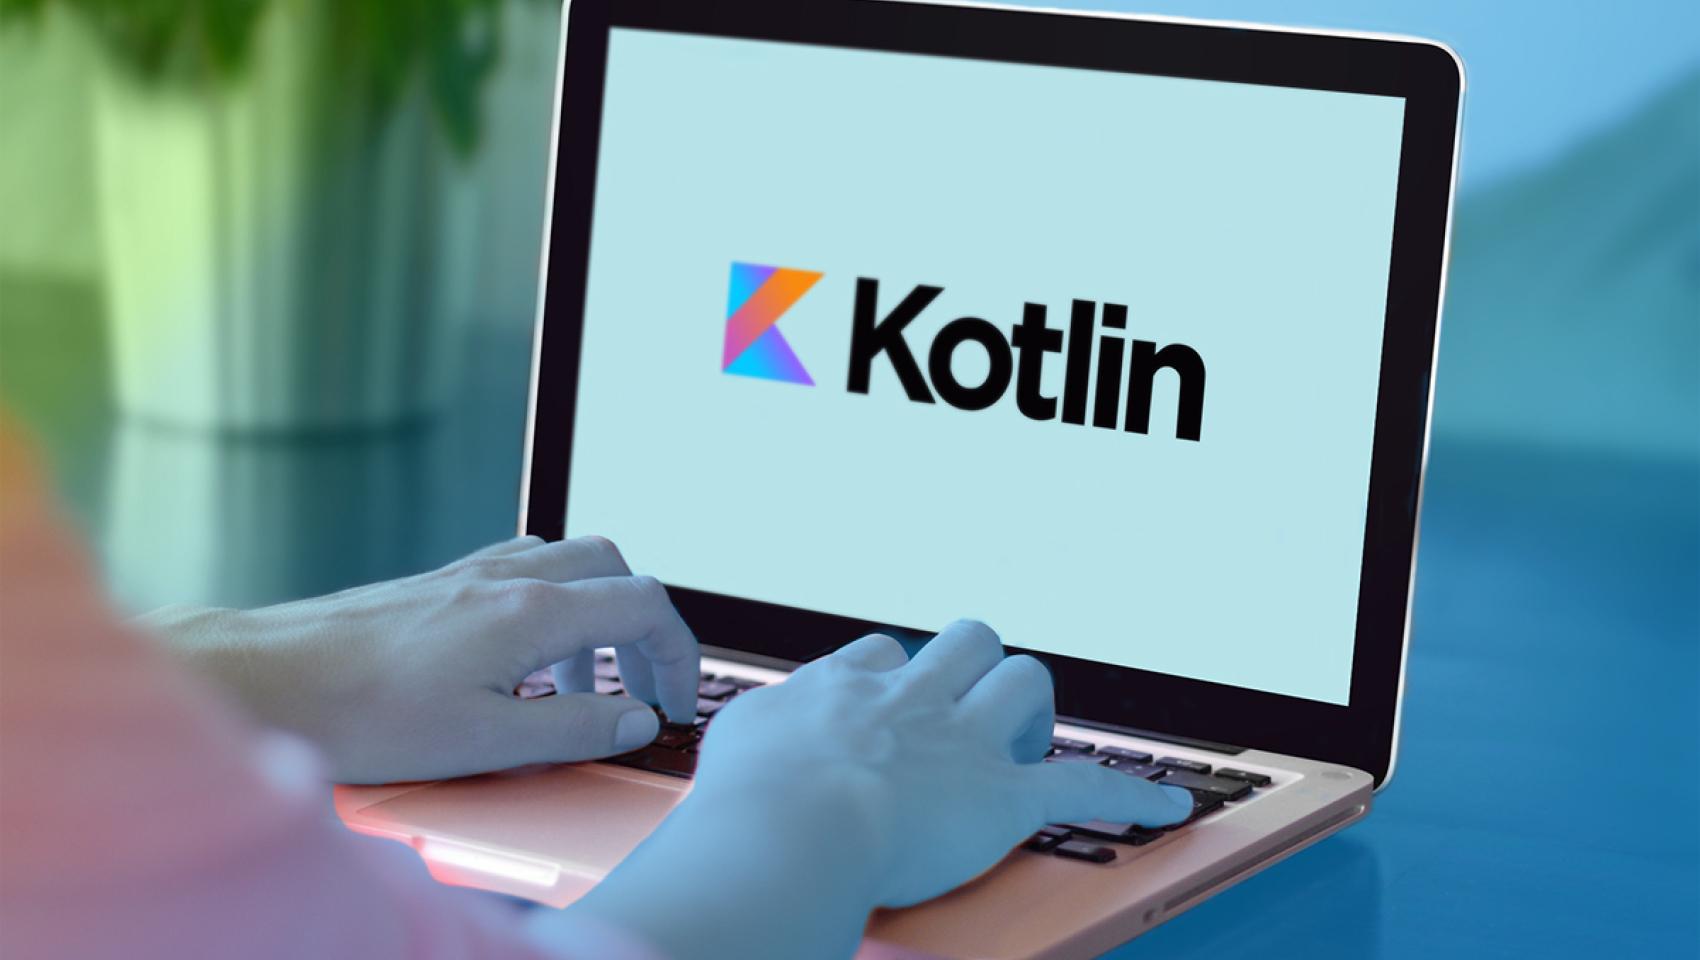 Мастер-класс «5 преимуществ Kotlin» в Днепре